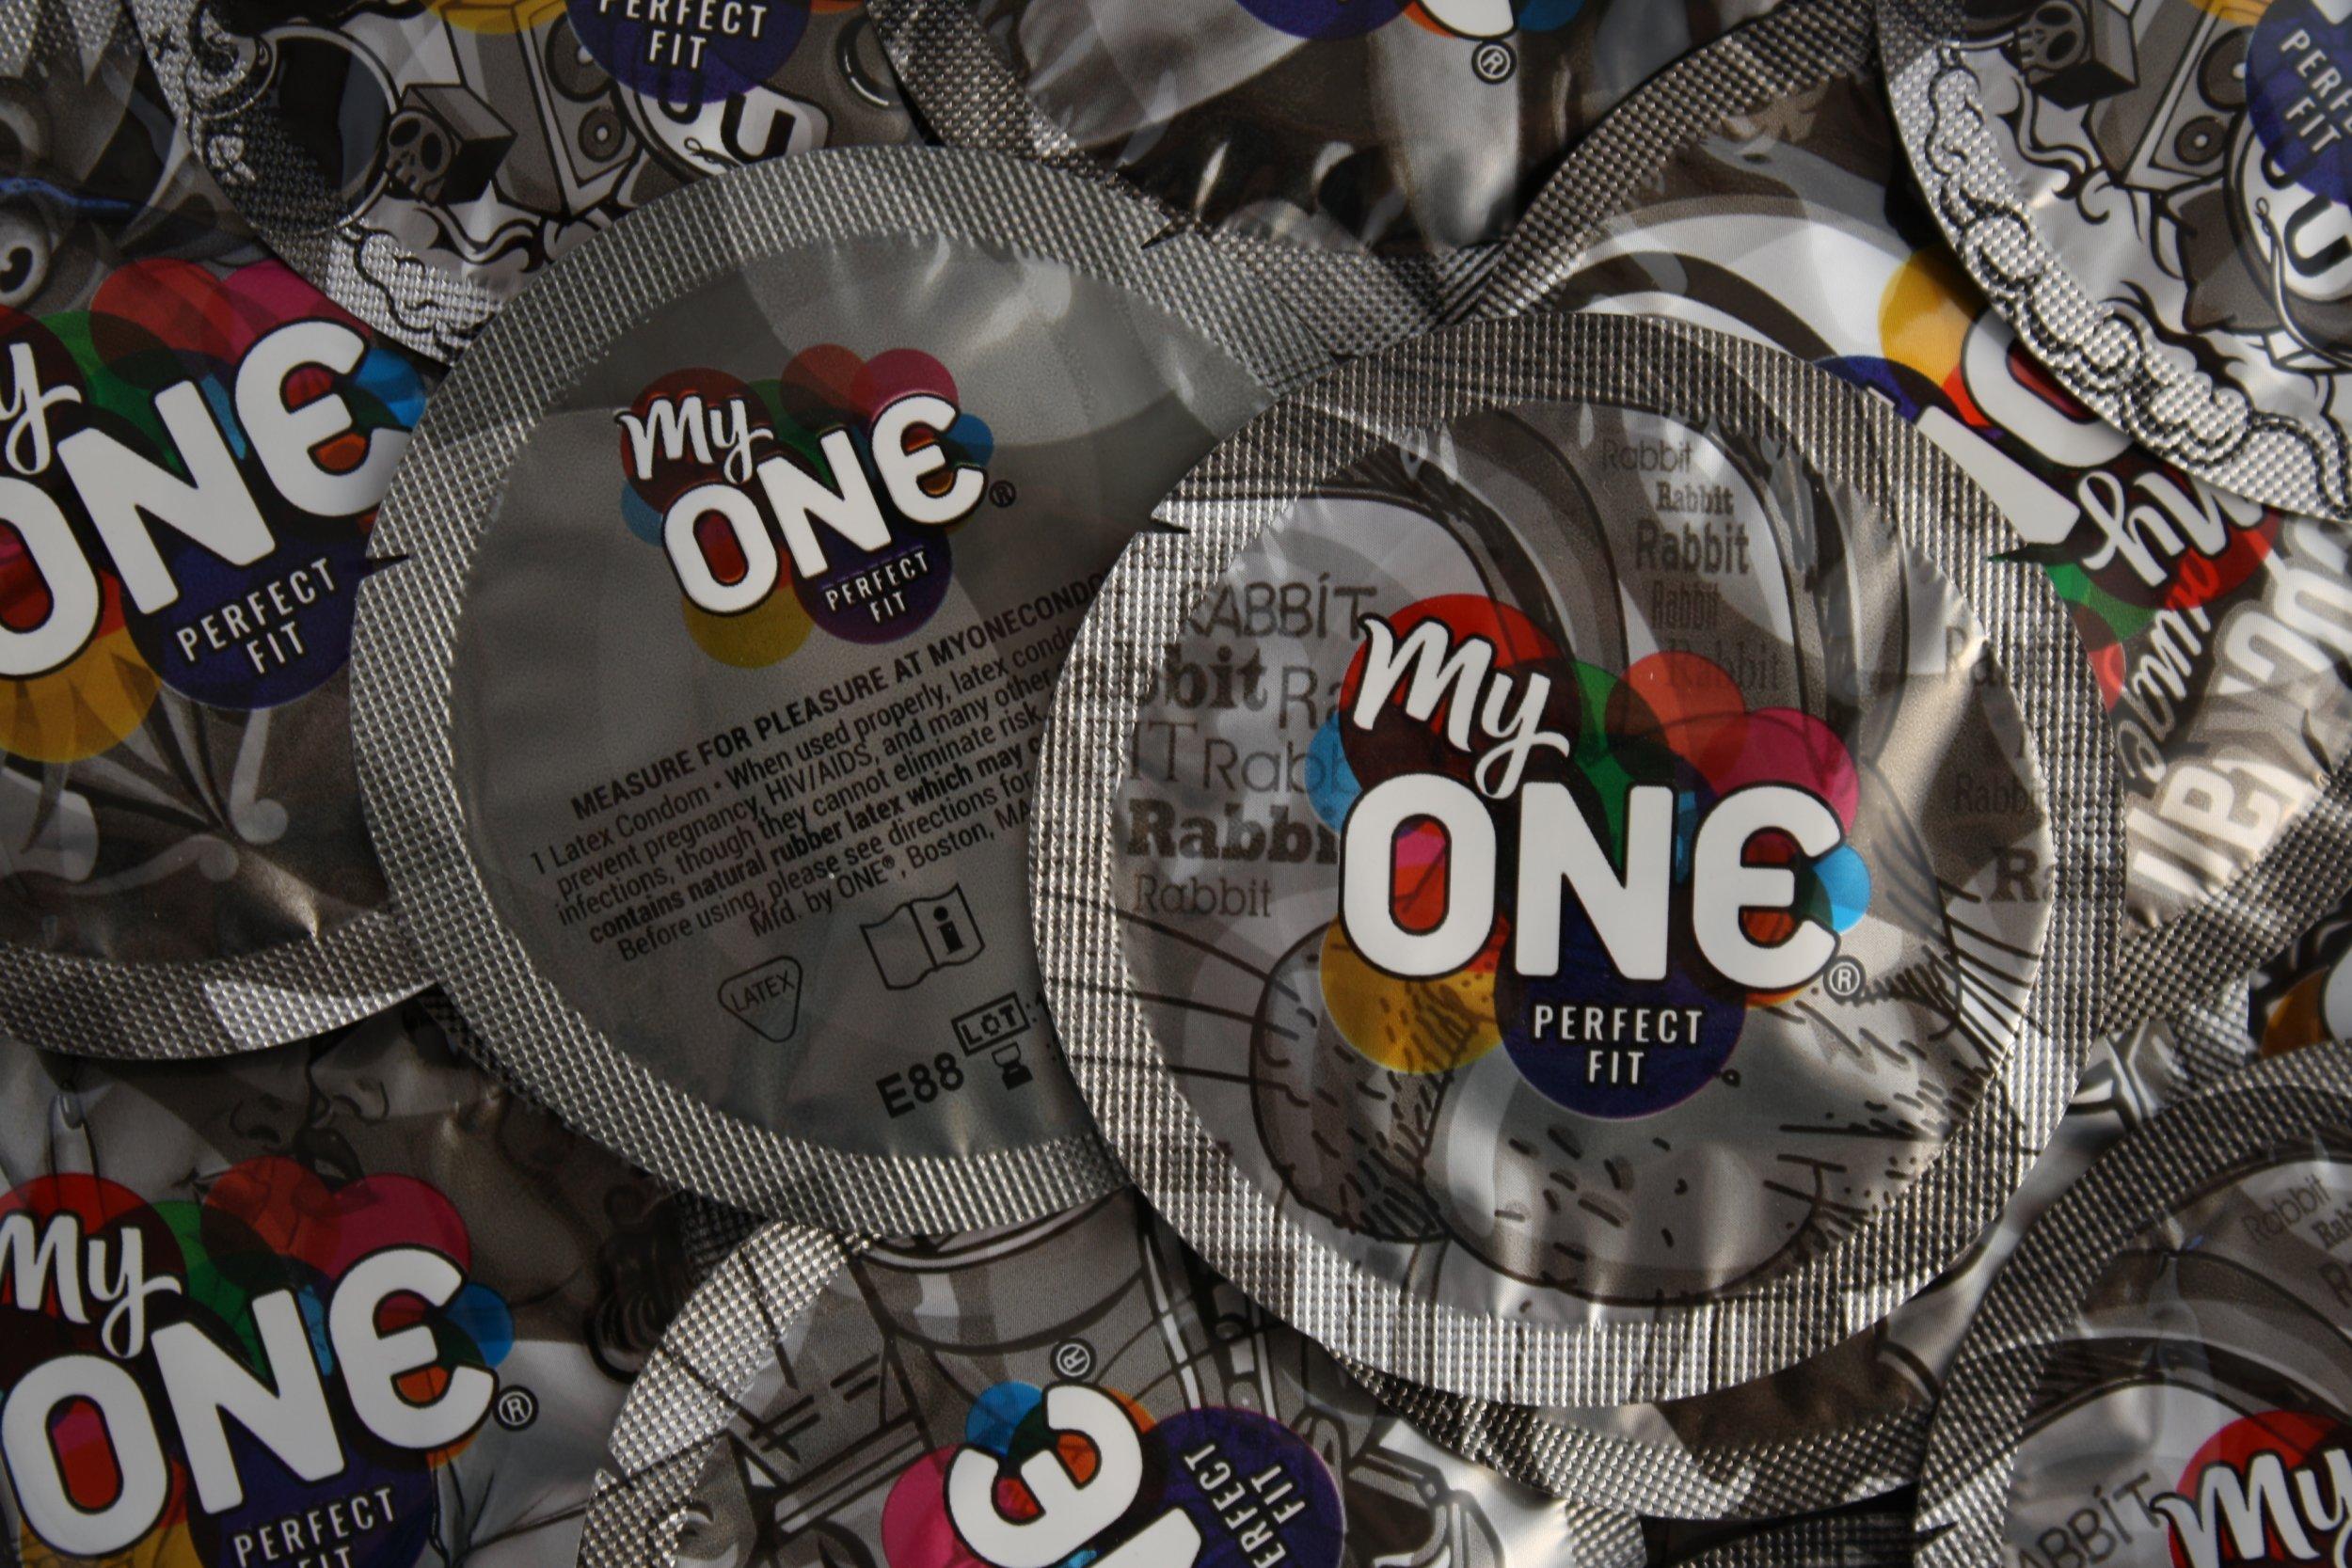 10_13_myONE Perfect Fit condoms